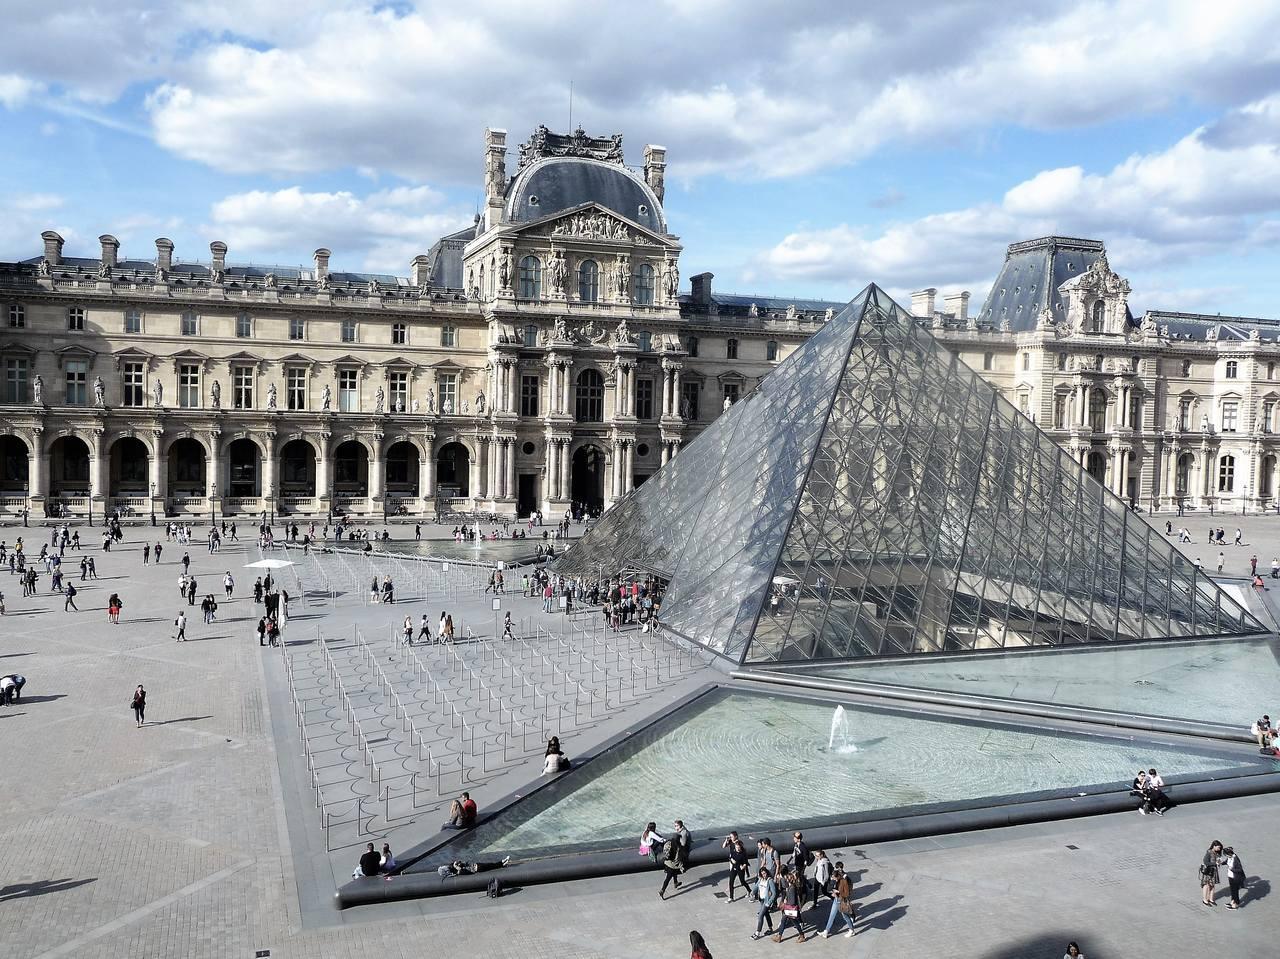 Louvre-7.6 (37)